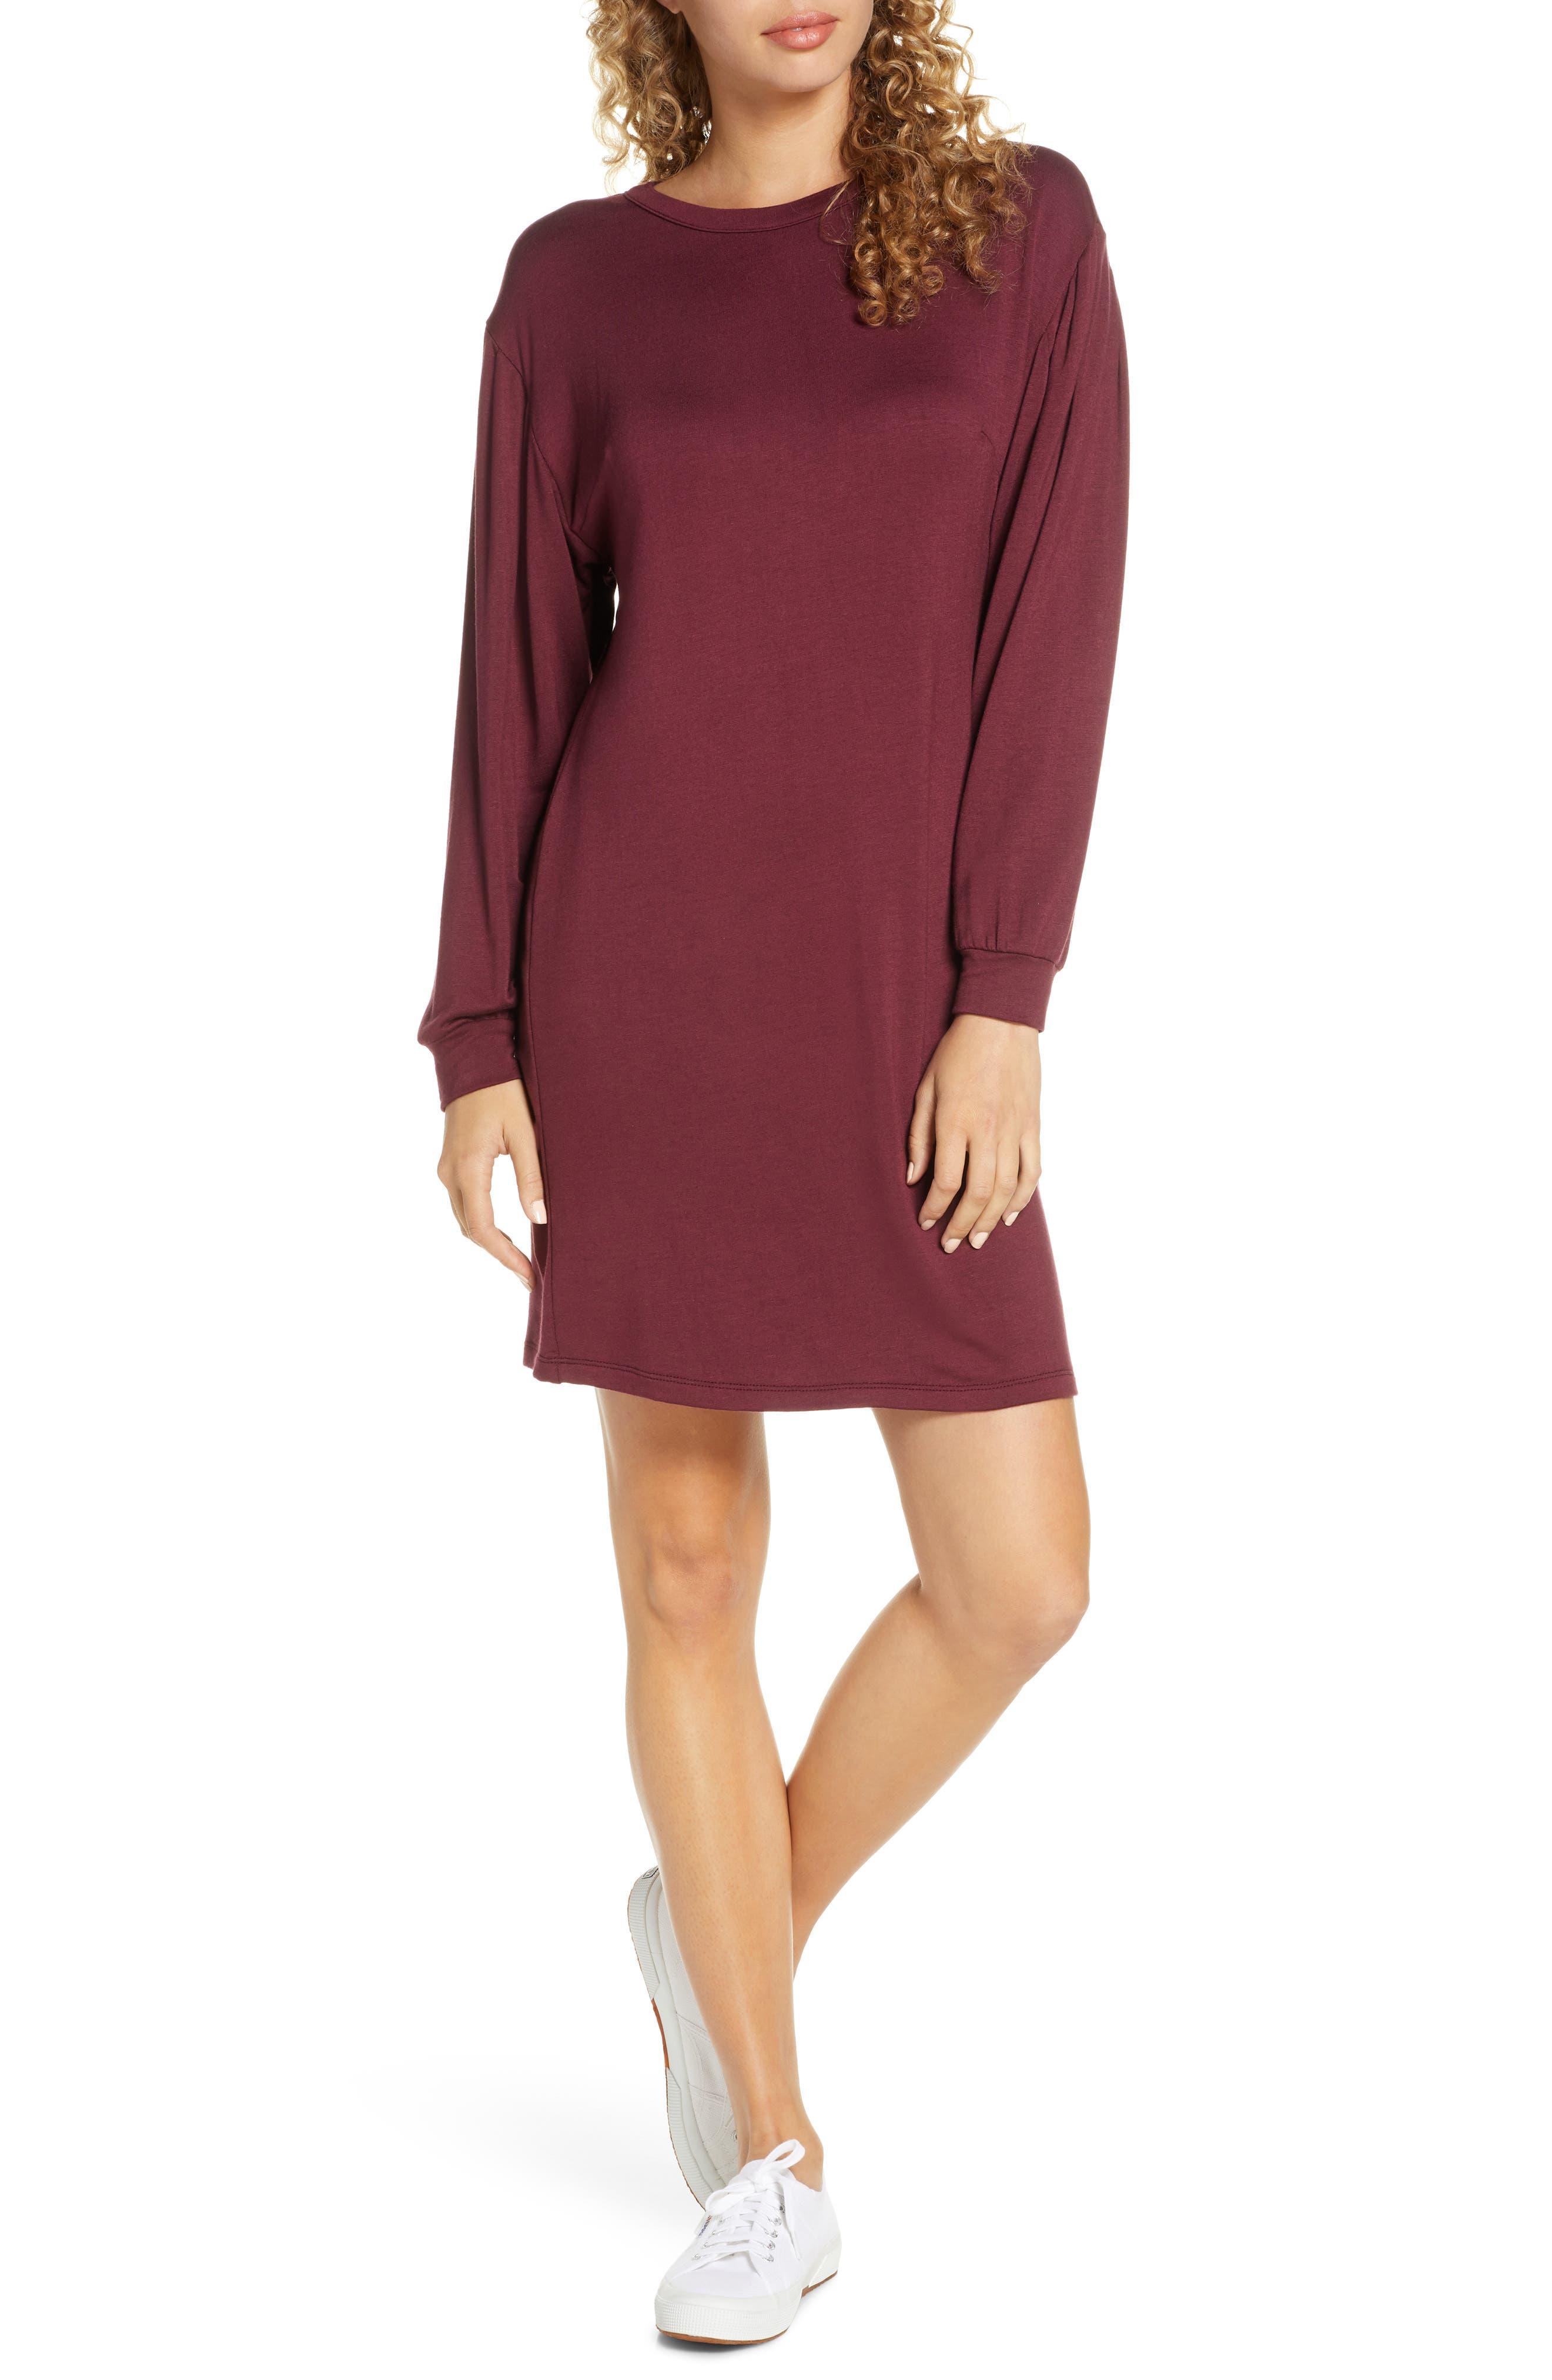 Image of Fraiche By J Crew Neck Sweatshirt Dress